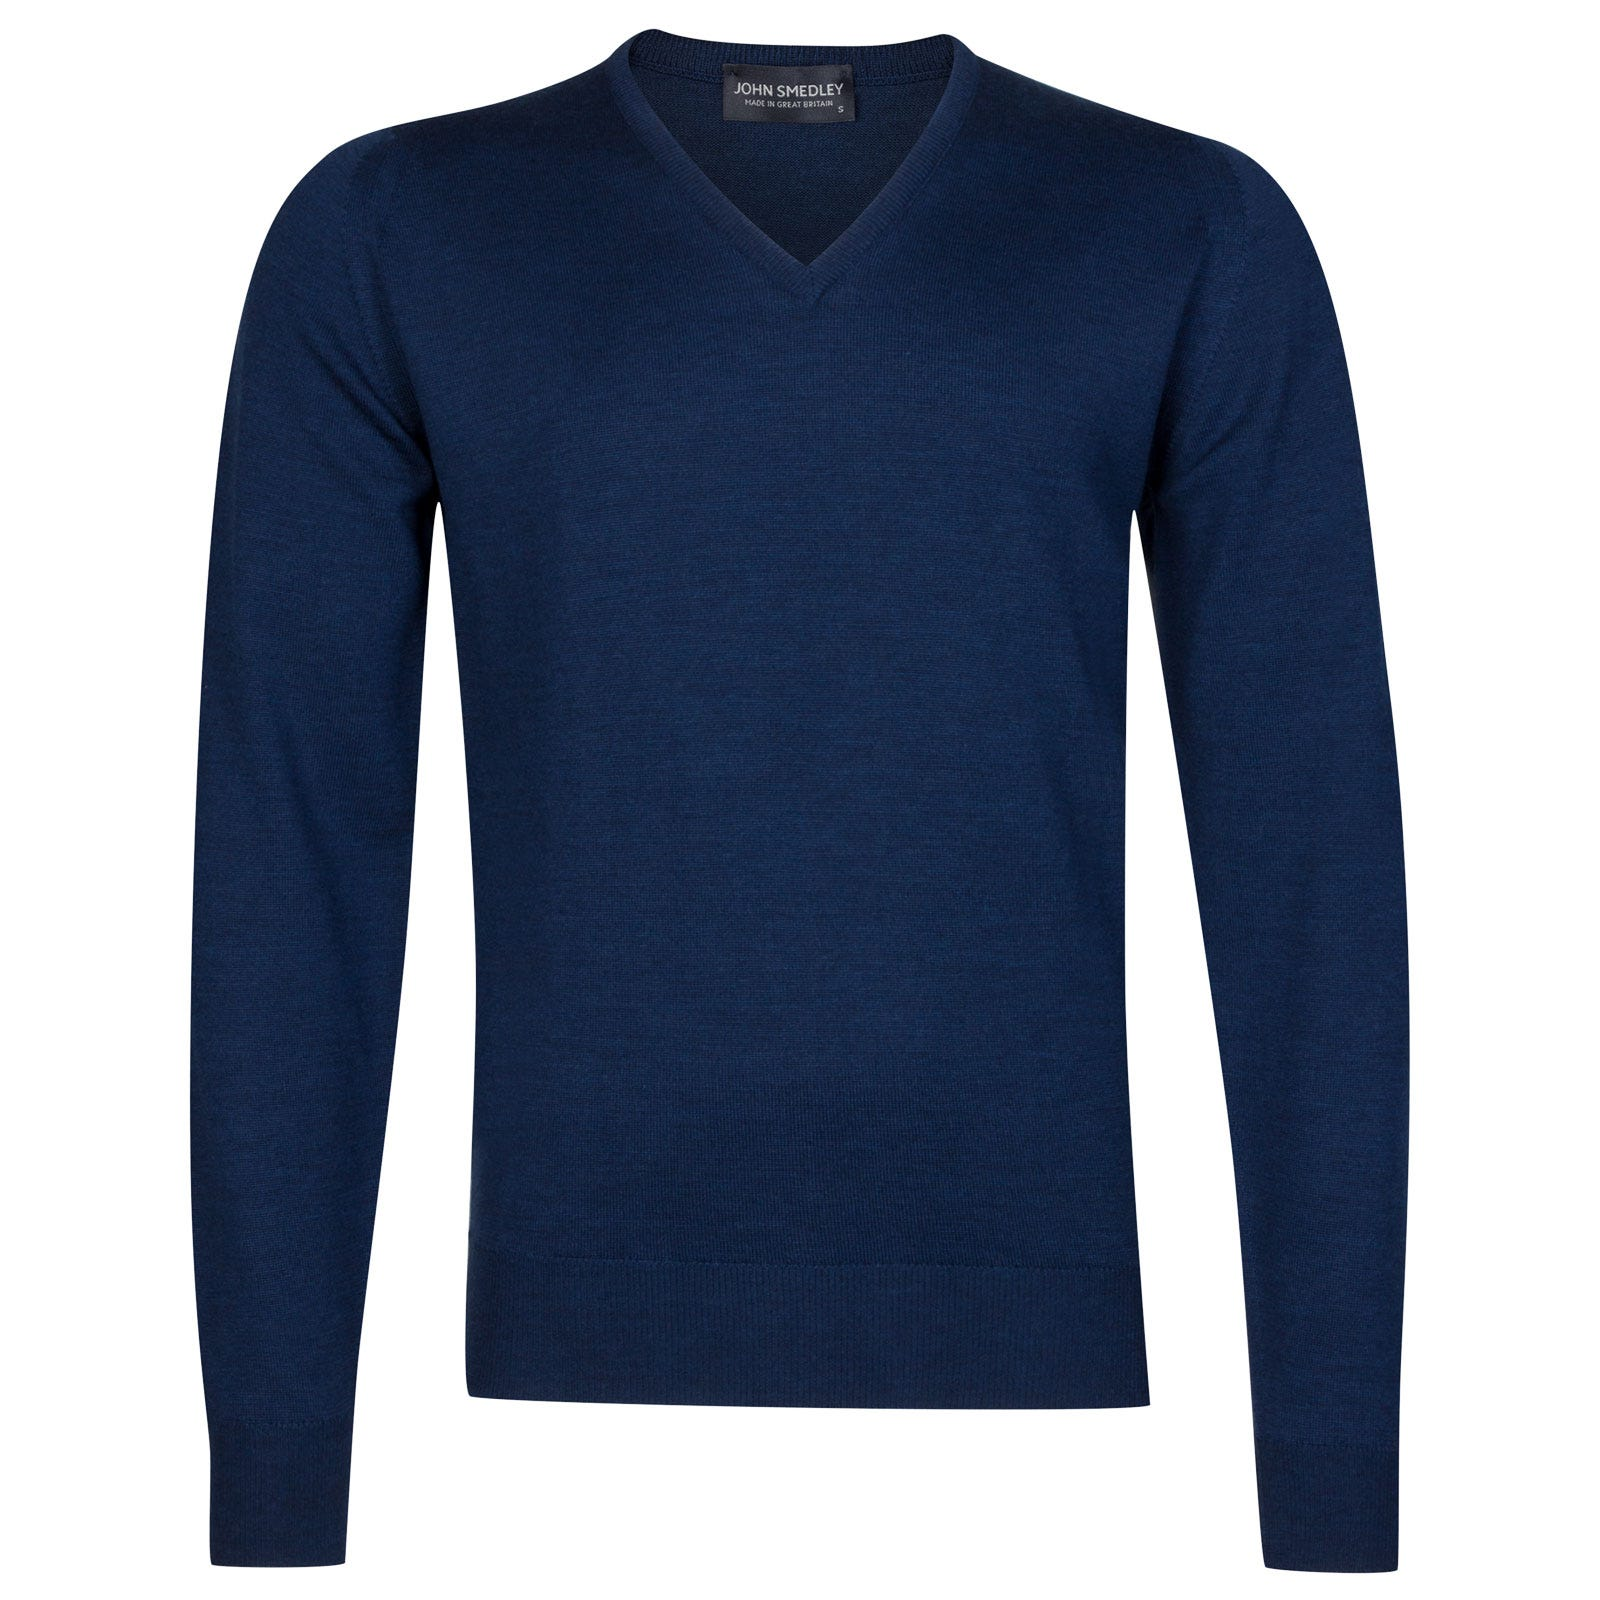 John Smedley Riber Merino Wool Pullover in Indigo-XL